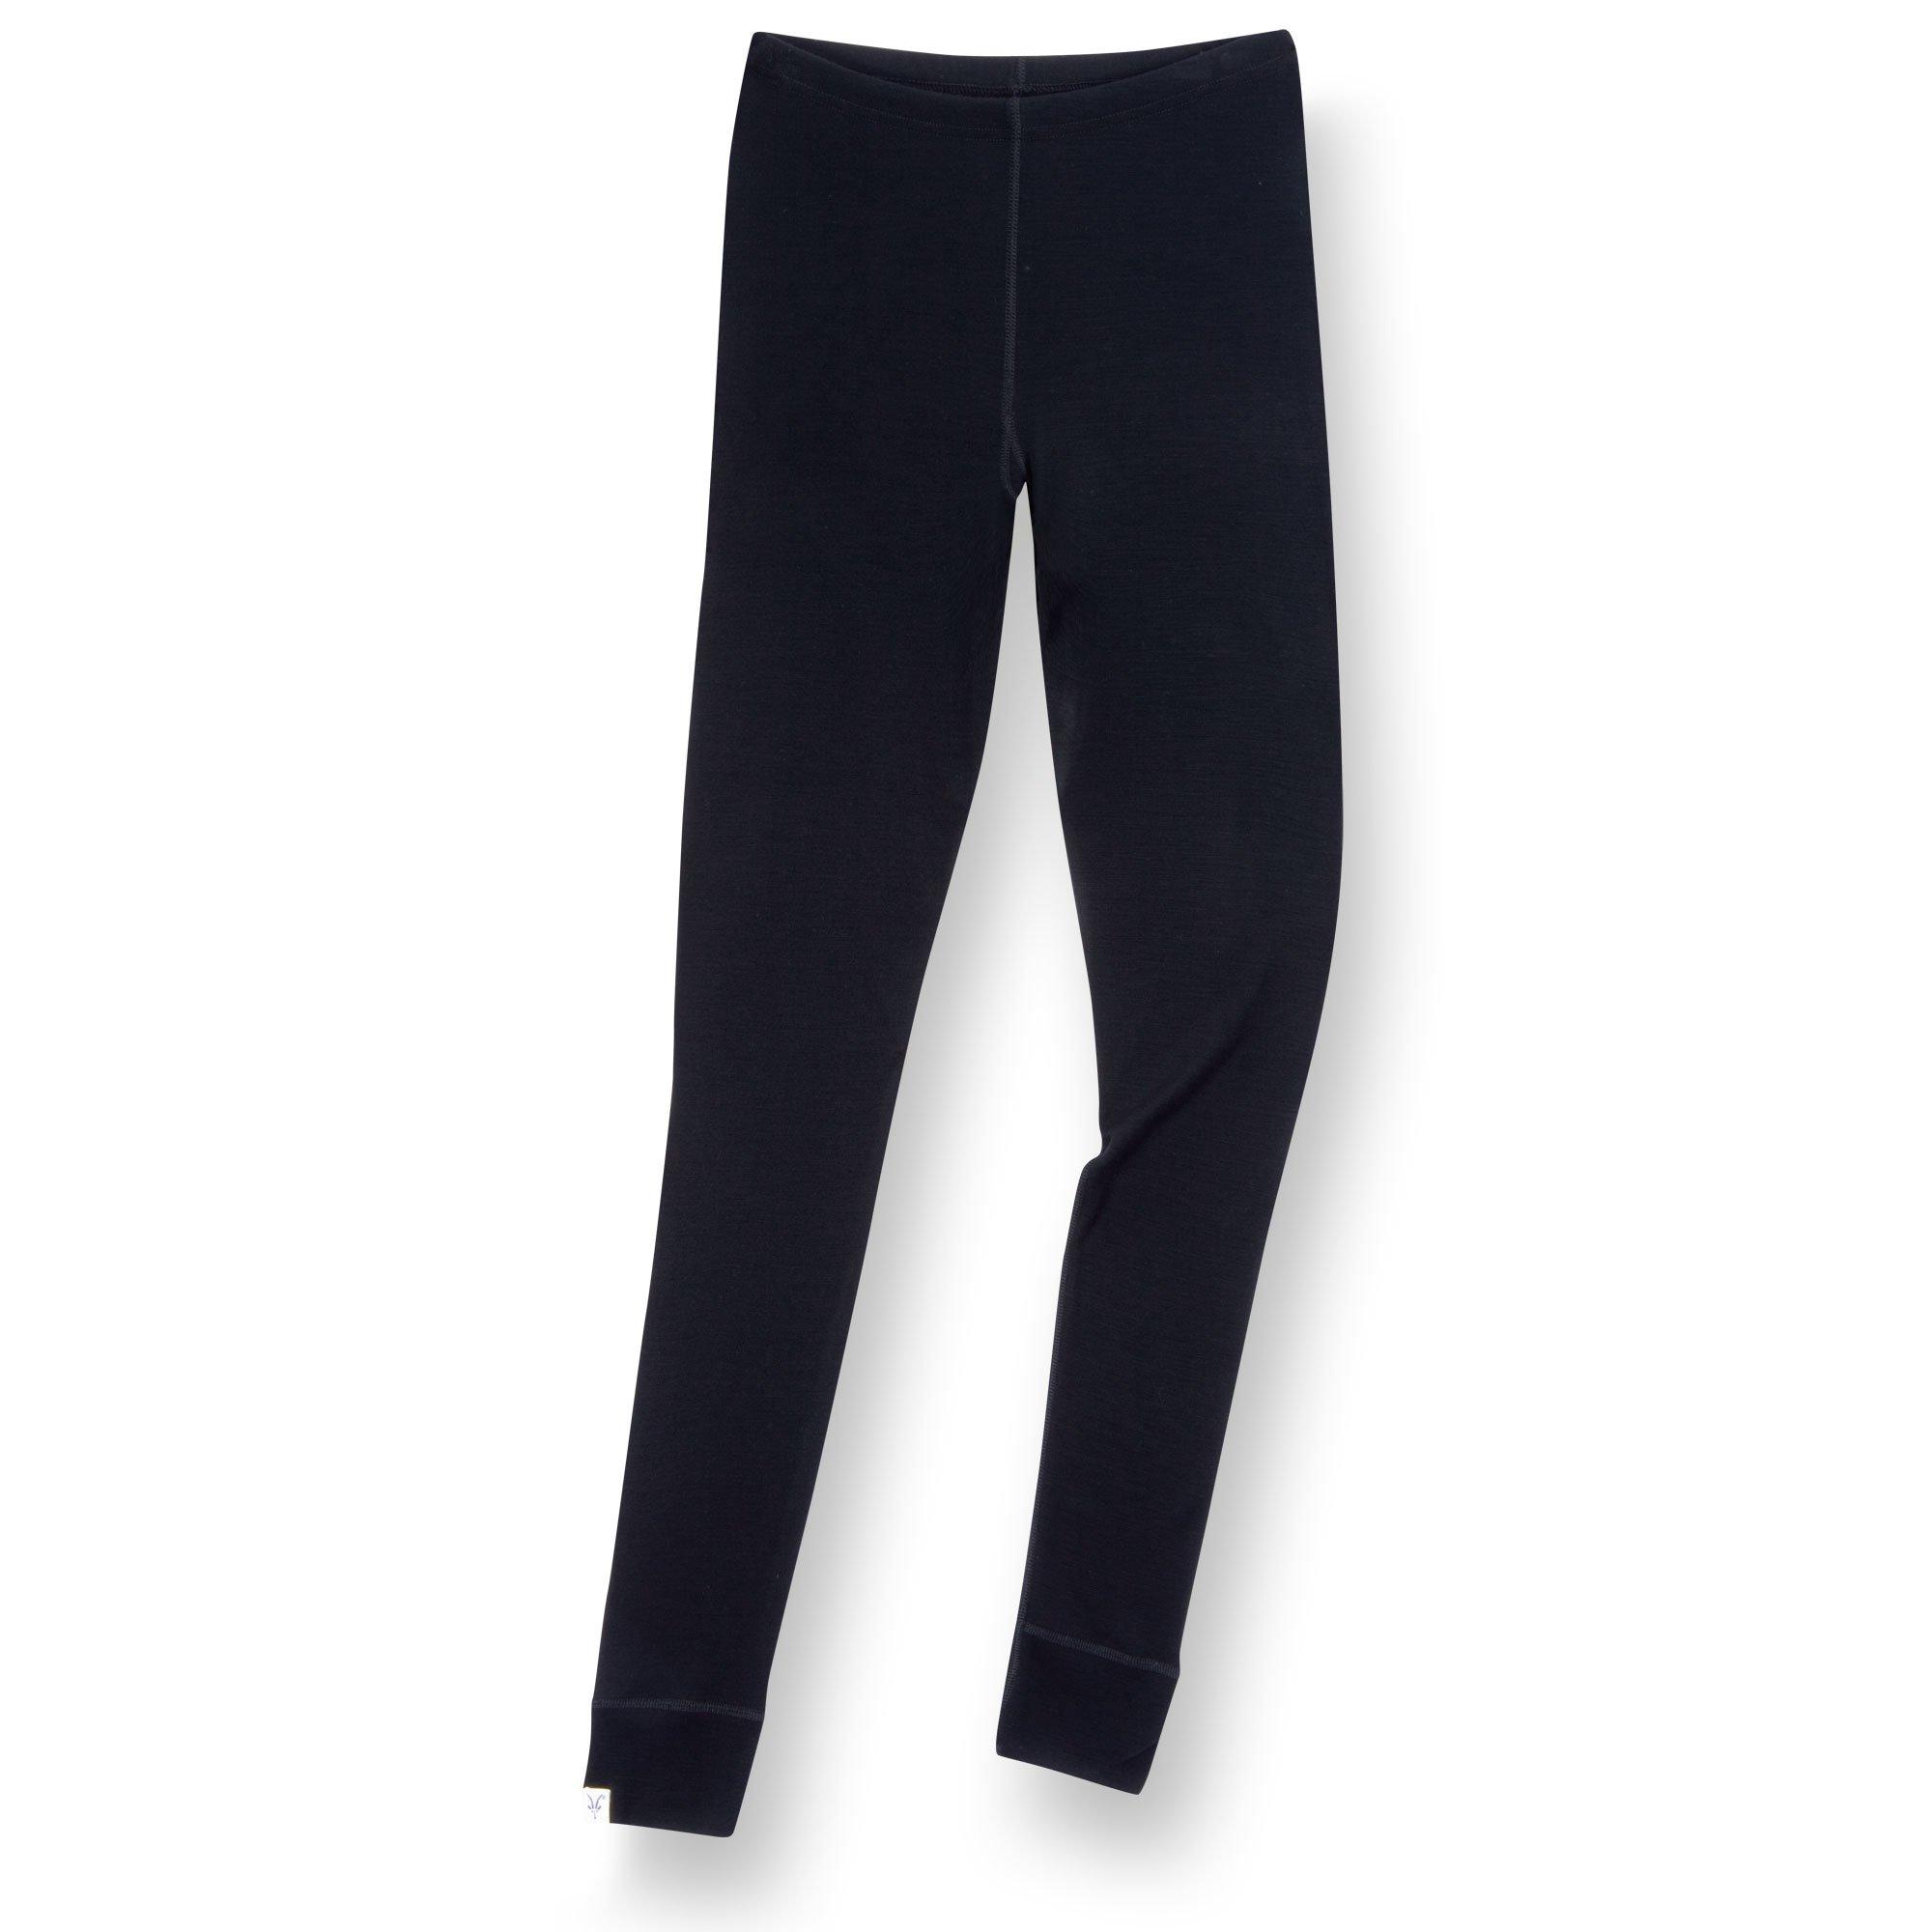 Ibex Women's Woolies Bottom,Black,X-Small